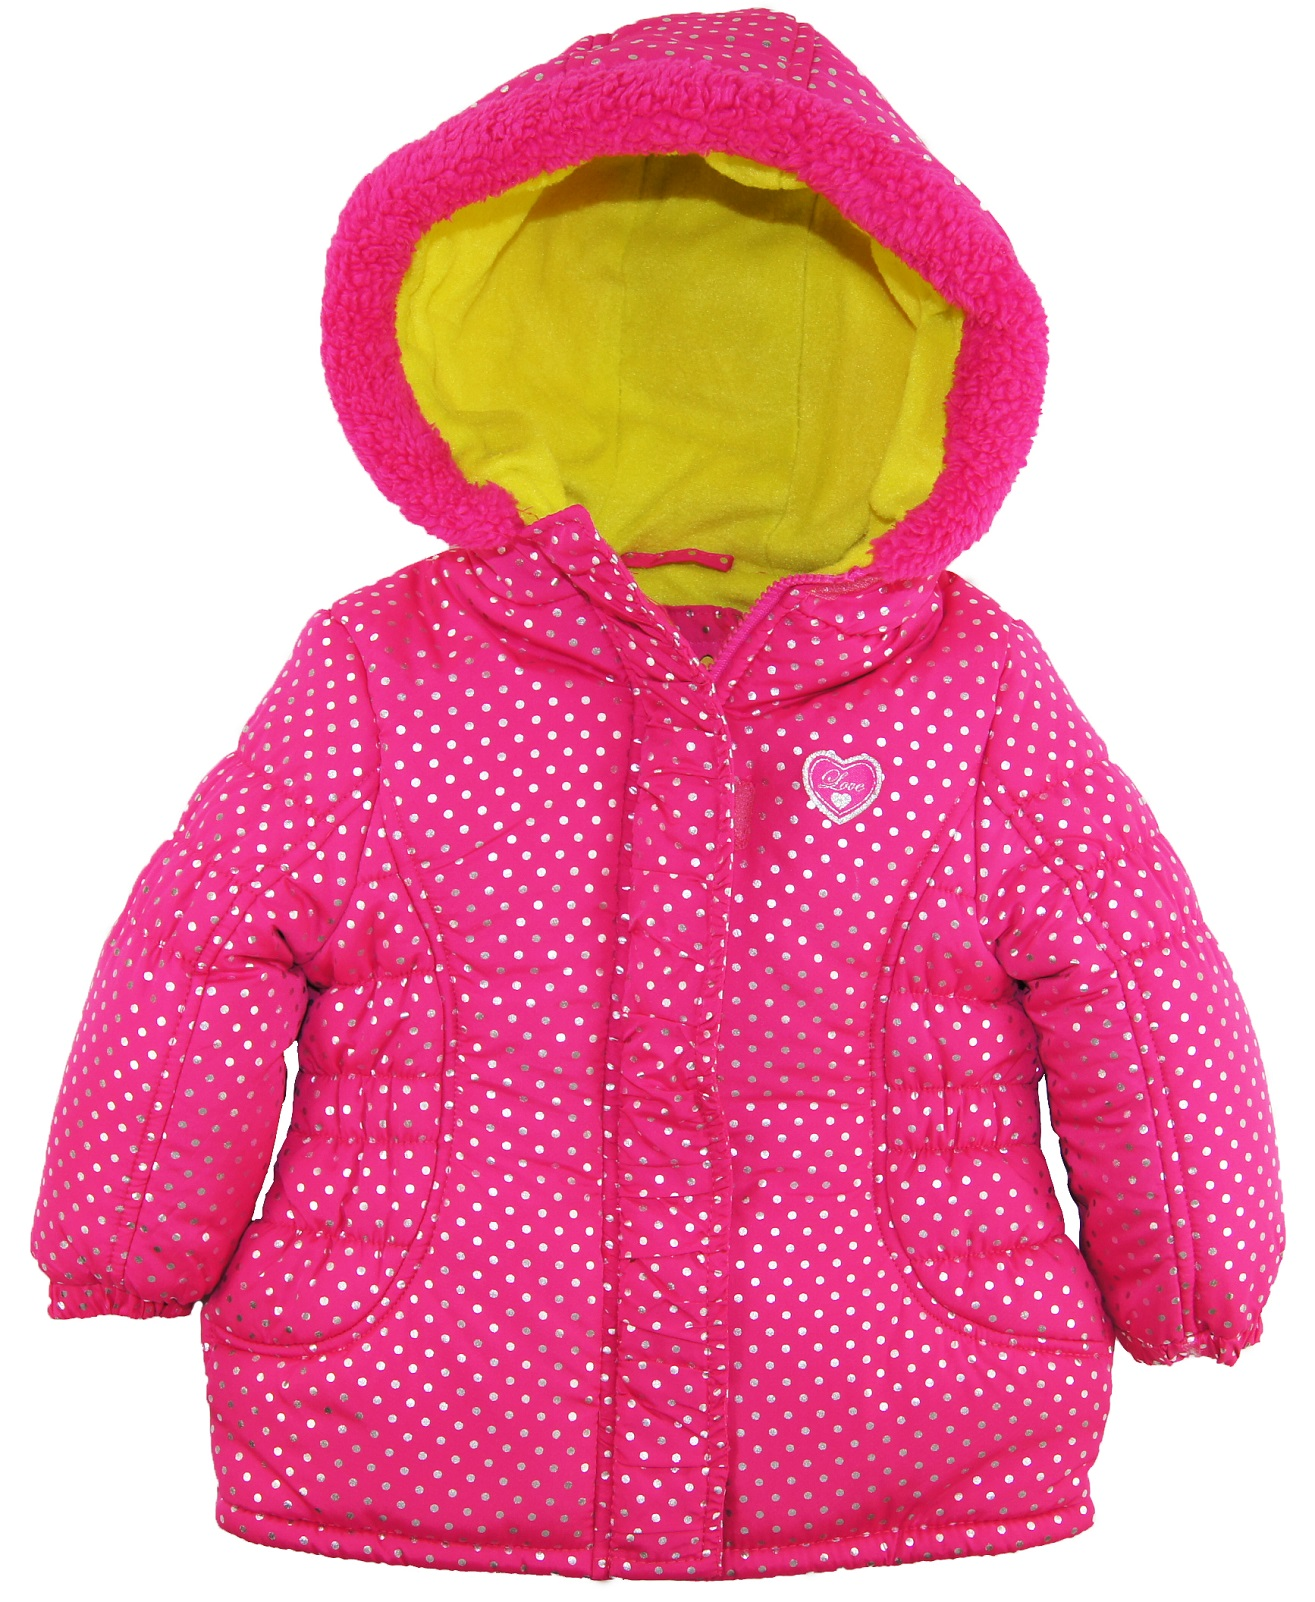 Pink Platinum Little Girls' Toddler Silver Polka Dots Puffer Winter Jacket Coat